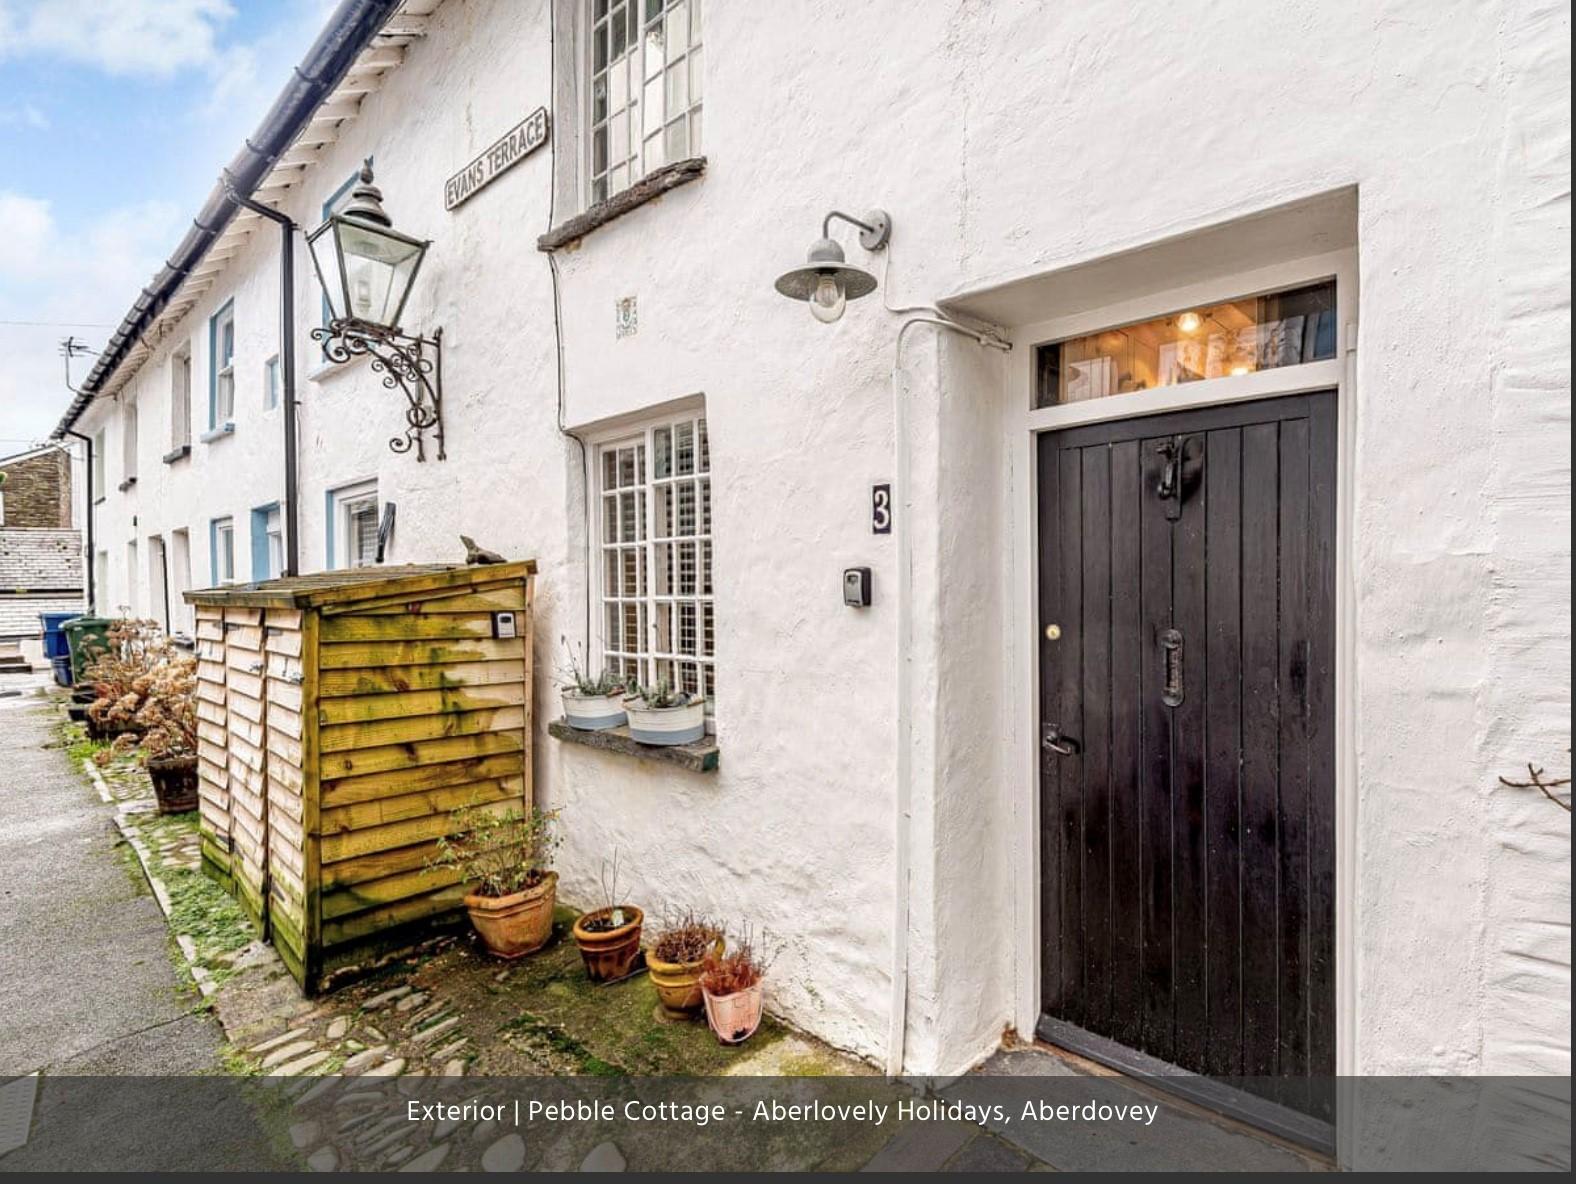 Pebble Cottage